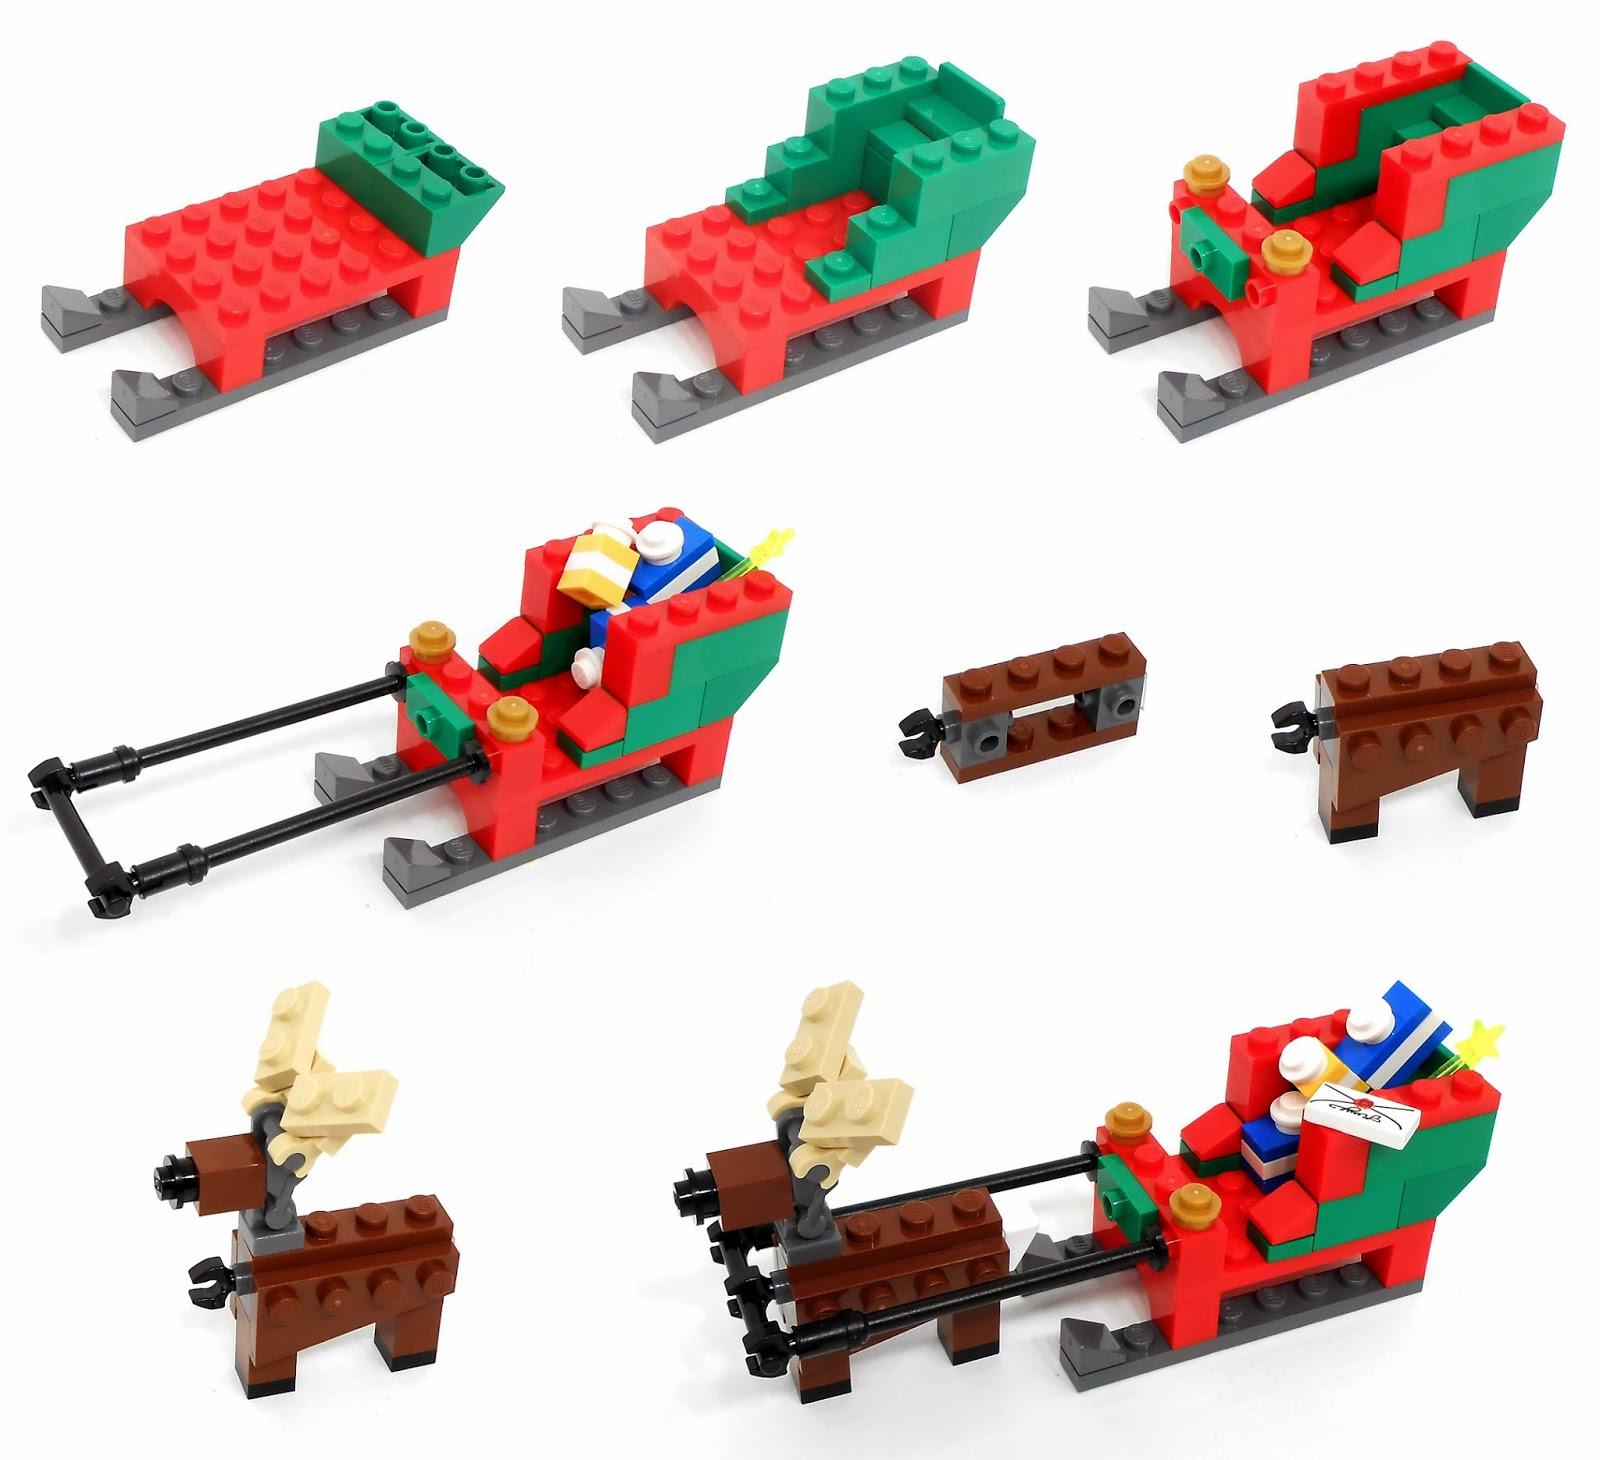 120in Wide Giant Santa Sleigh Two Reindeer Set: Oz Brick Nation: LEGO S@H Exclusive 40059: Santa's Sleigh